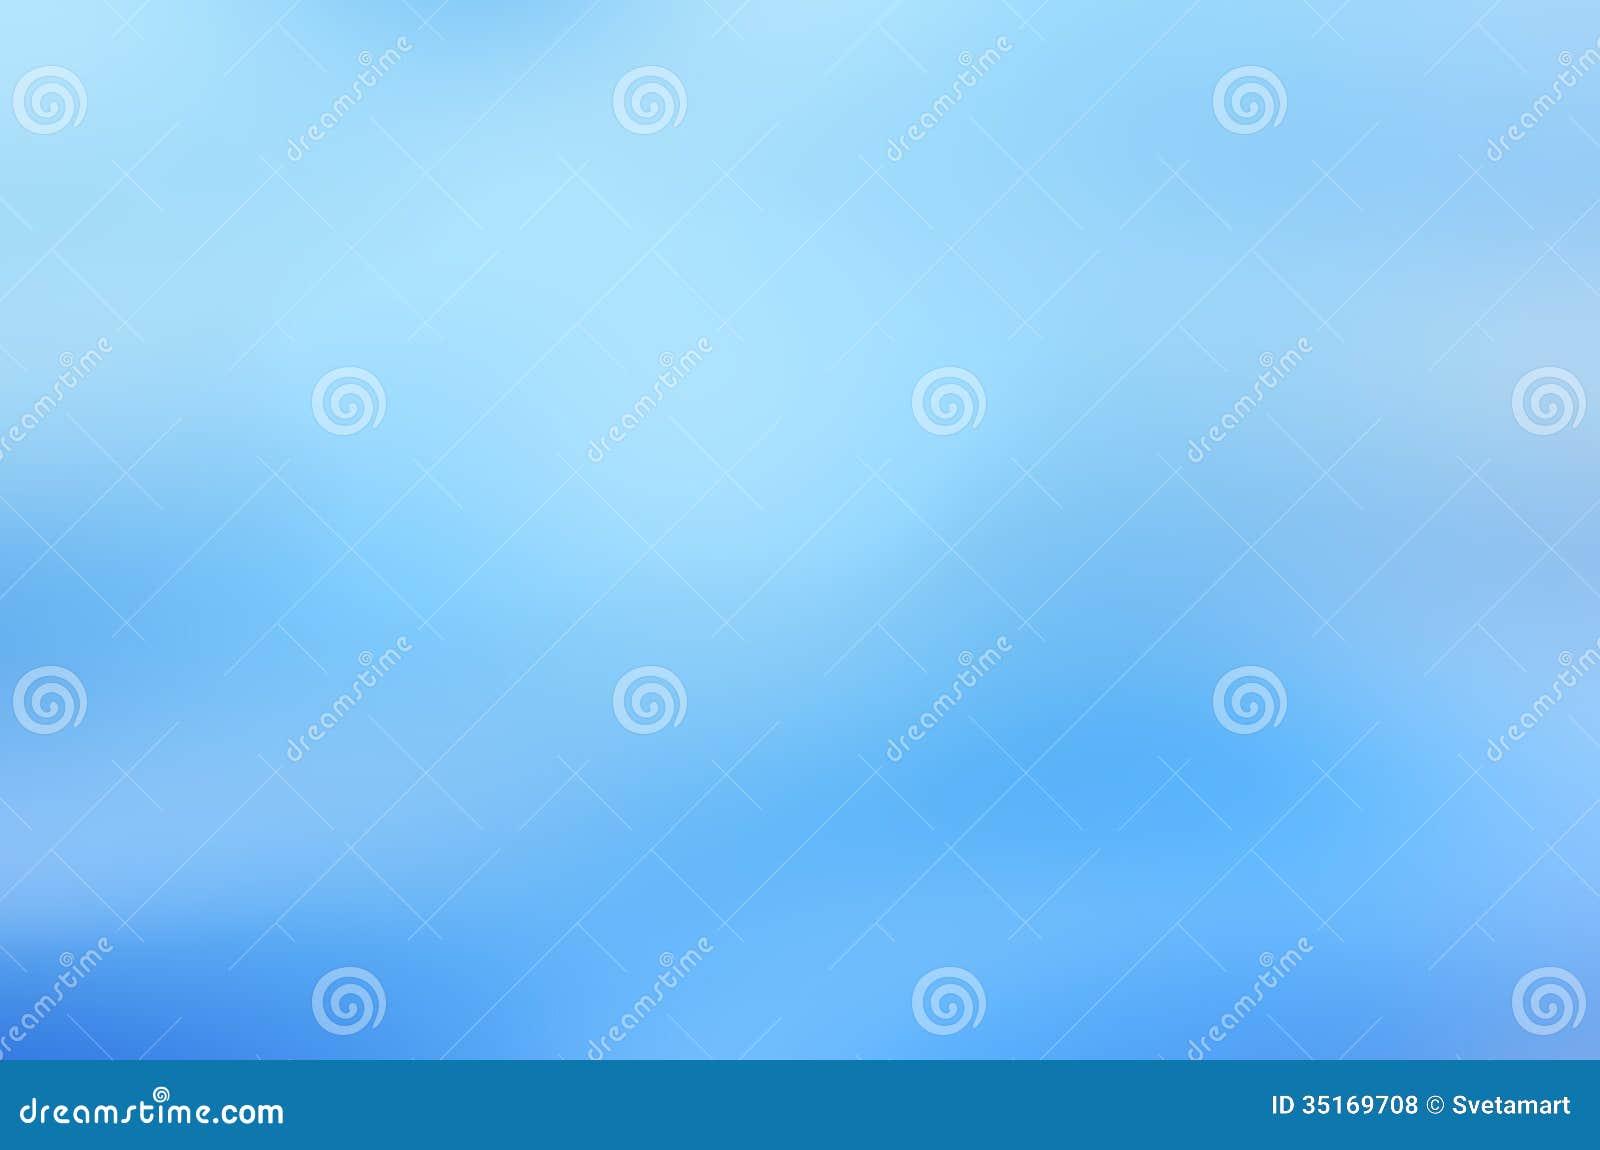 background images for websites in blue color www